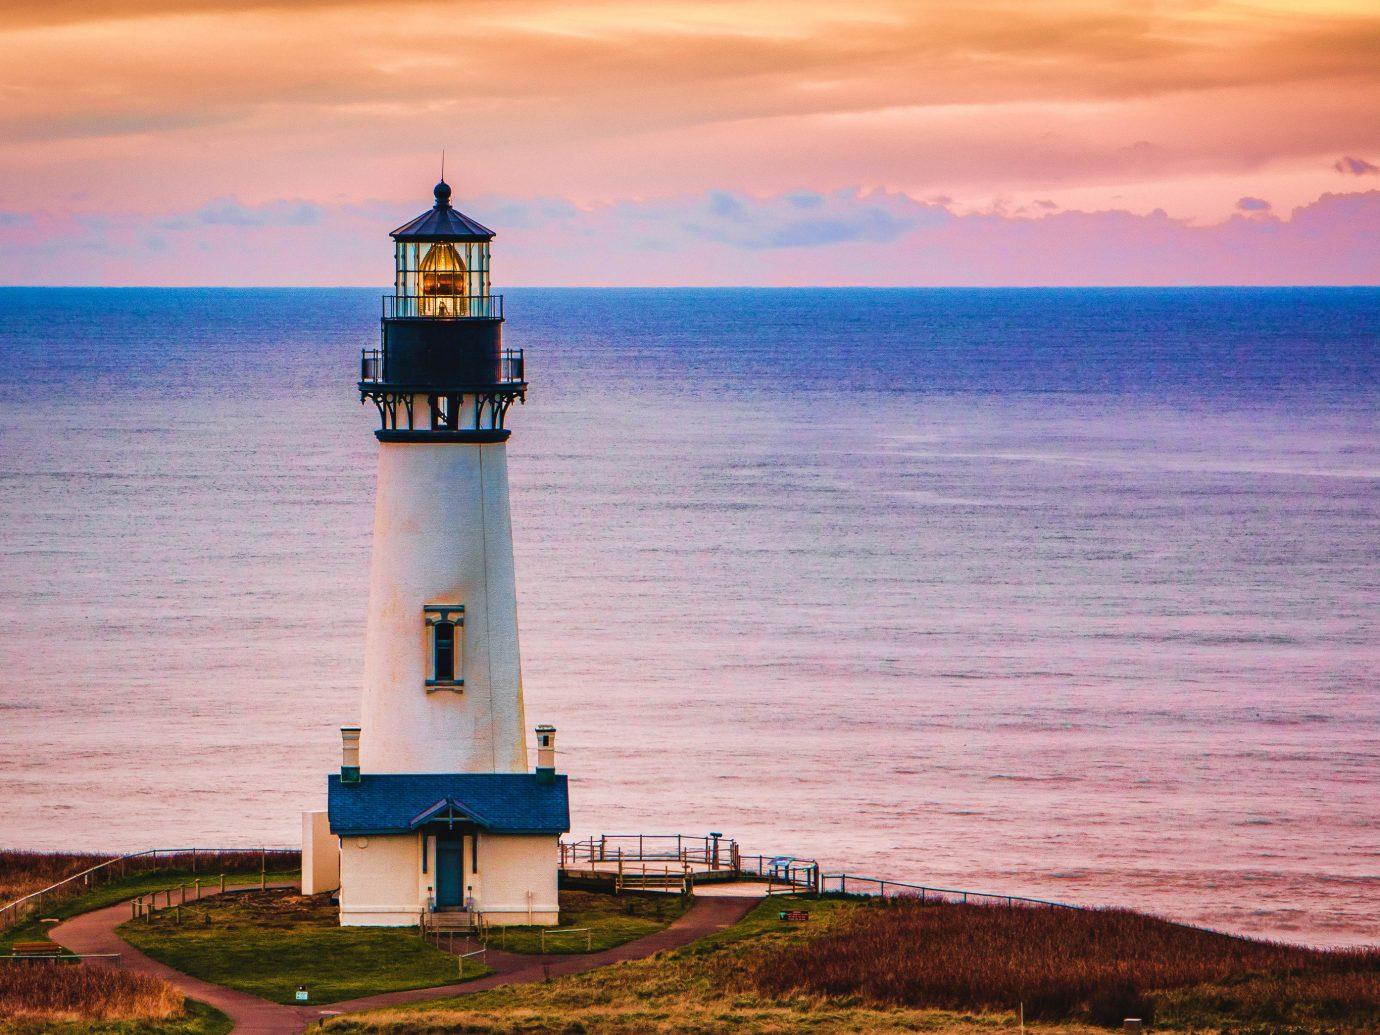 America Beach Trip Ideas West Coast lighthouse tower Sea sky beacon promontory Coast horizon shore Ocean cloud daytime evening headland dusk Sunset calm